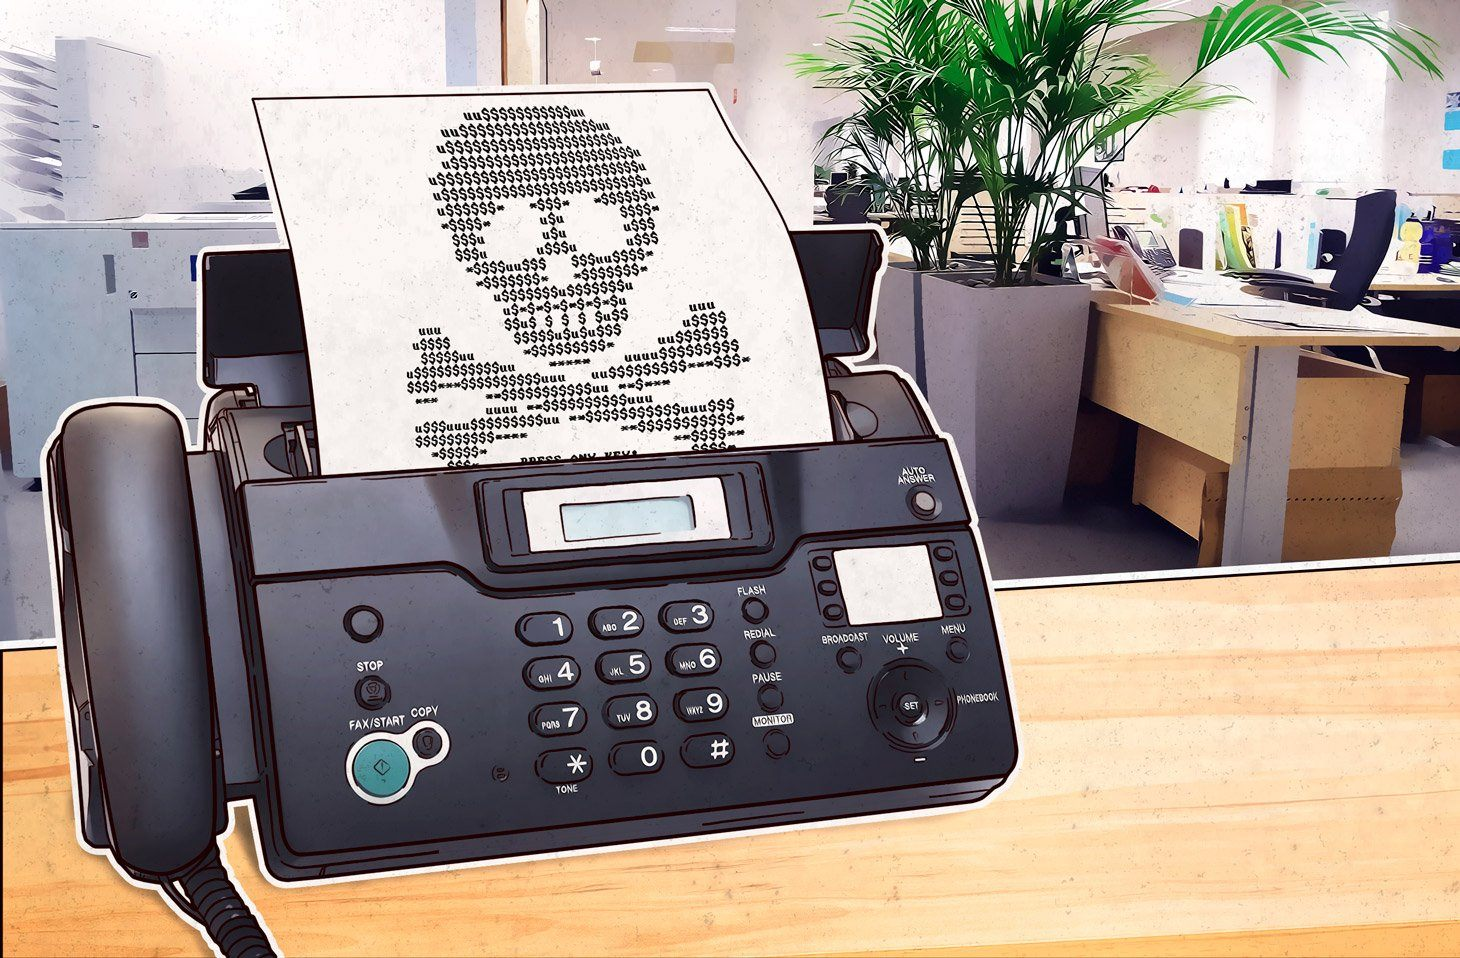 Faxに関する8つの豆知識:Fax?...